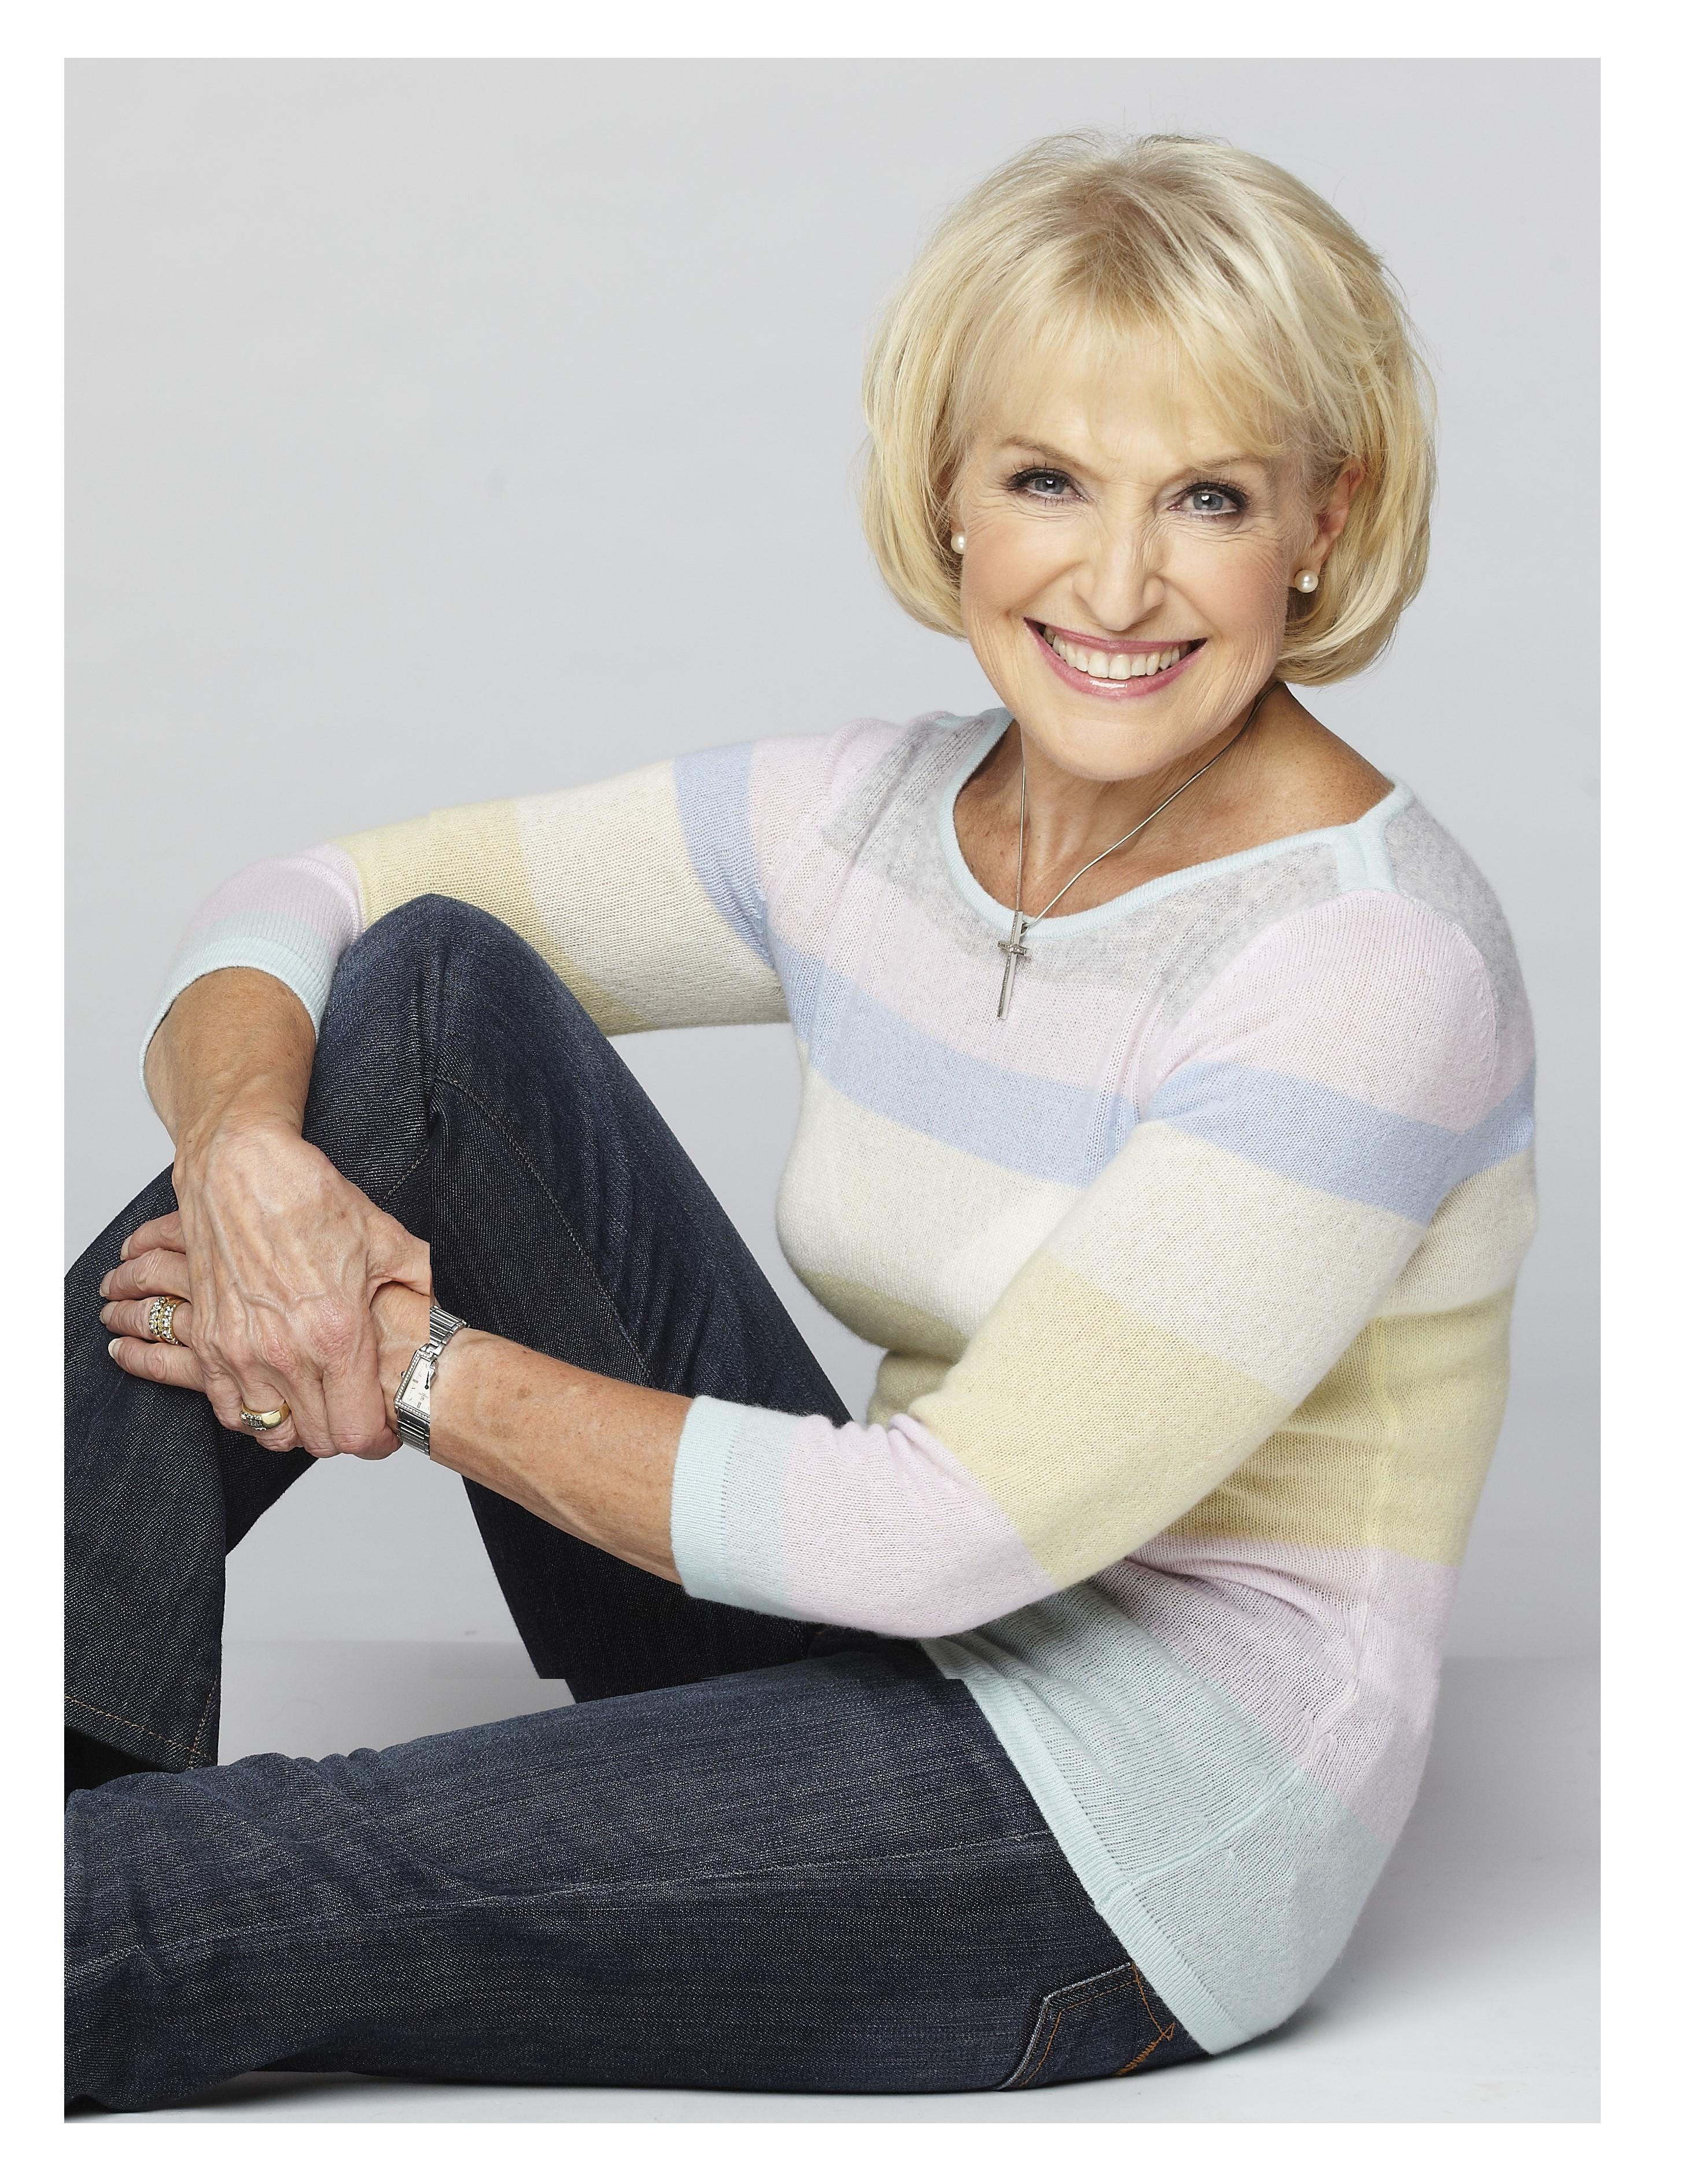 Rosemary Conley CBE